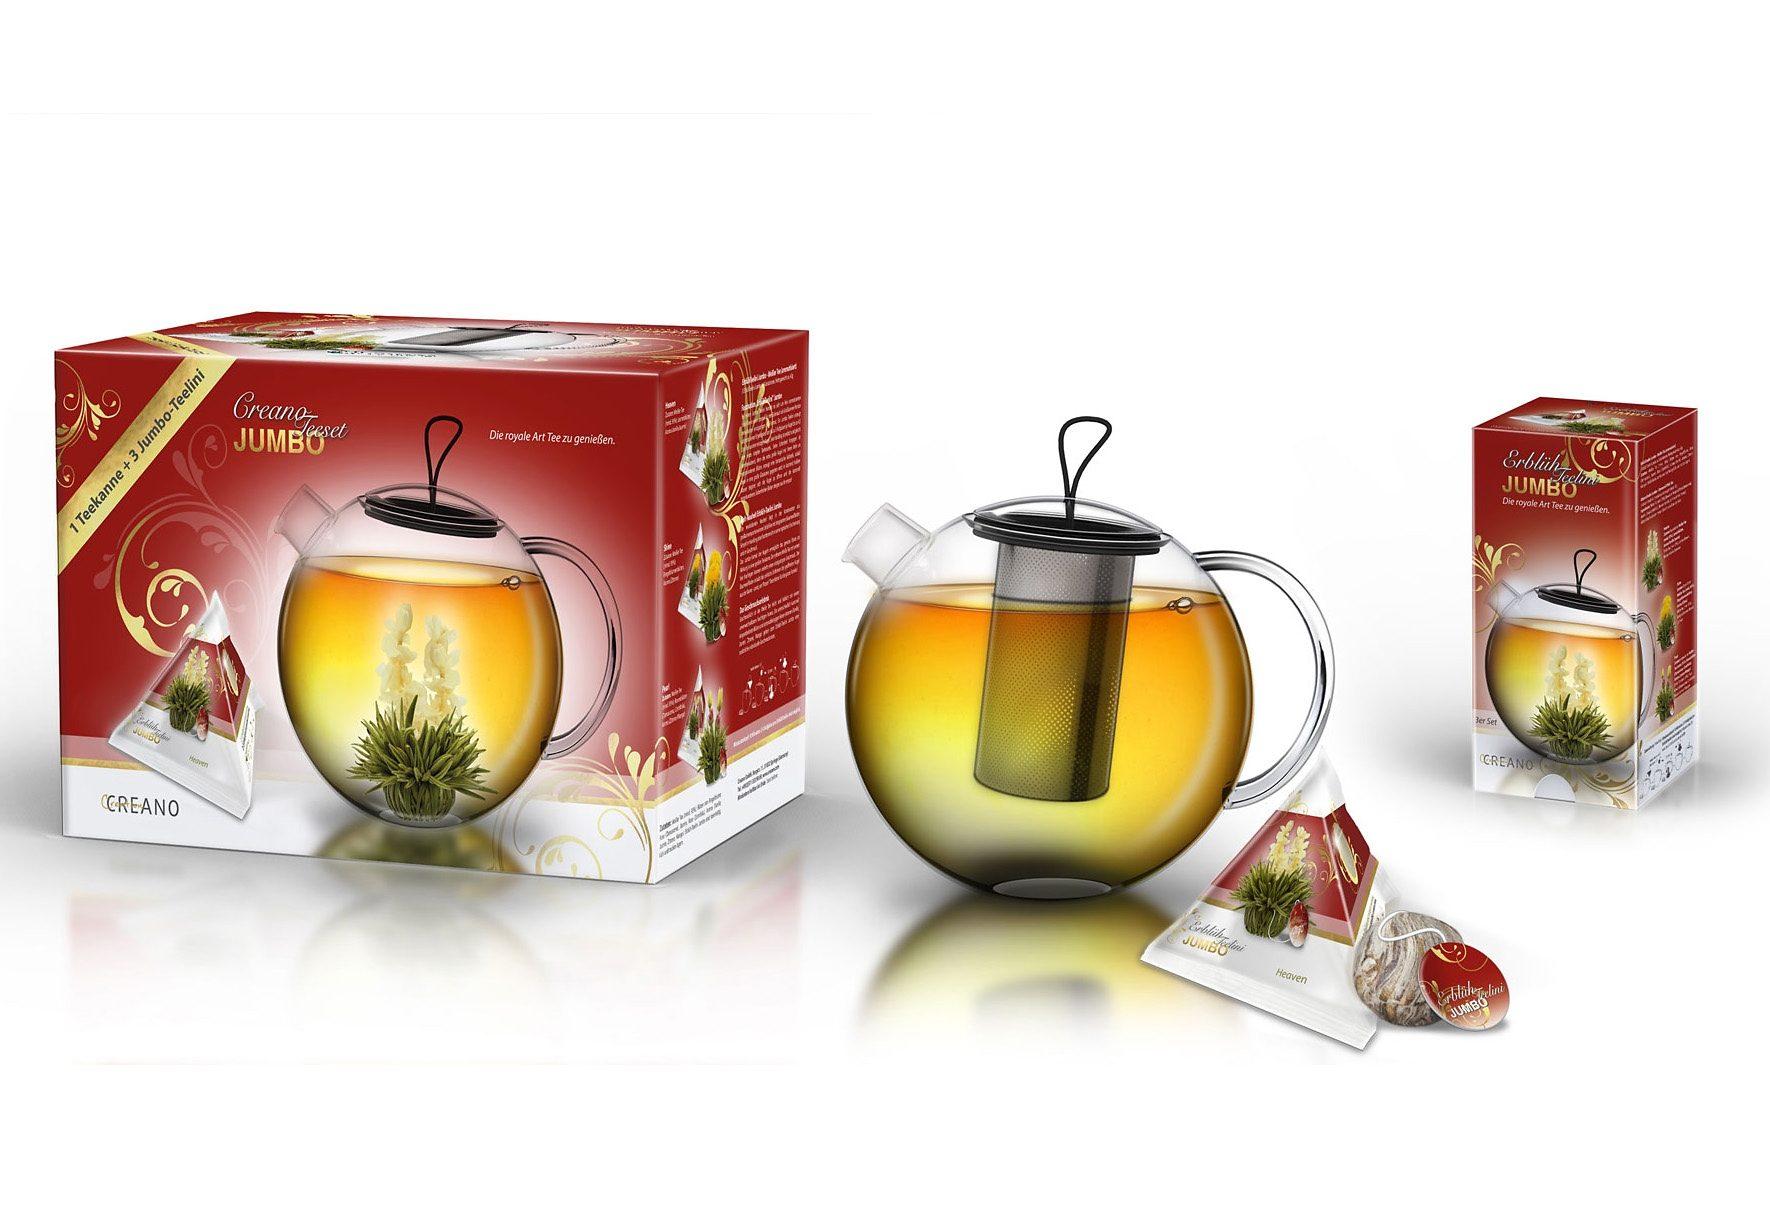 Creano Erblüh-Teelini JUMBO, »Weißer Tee«